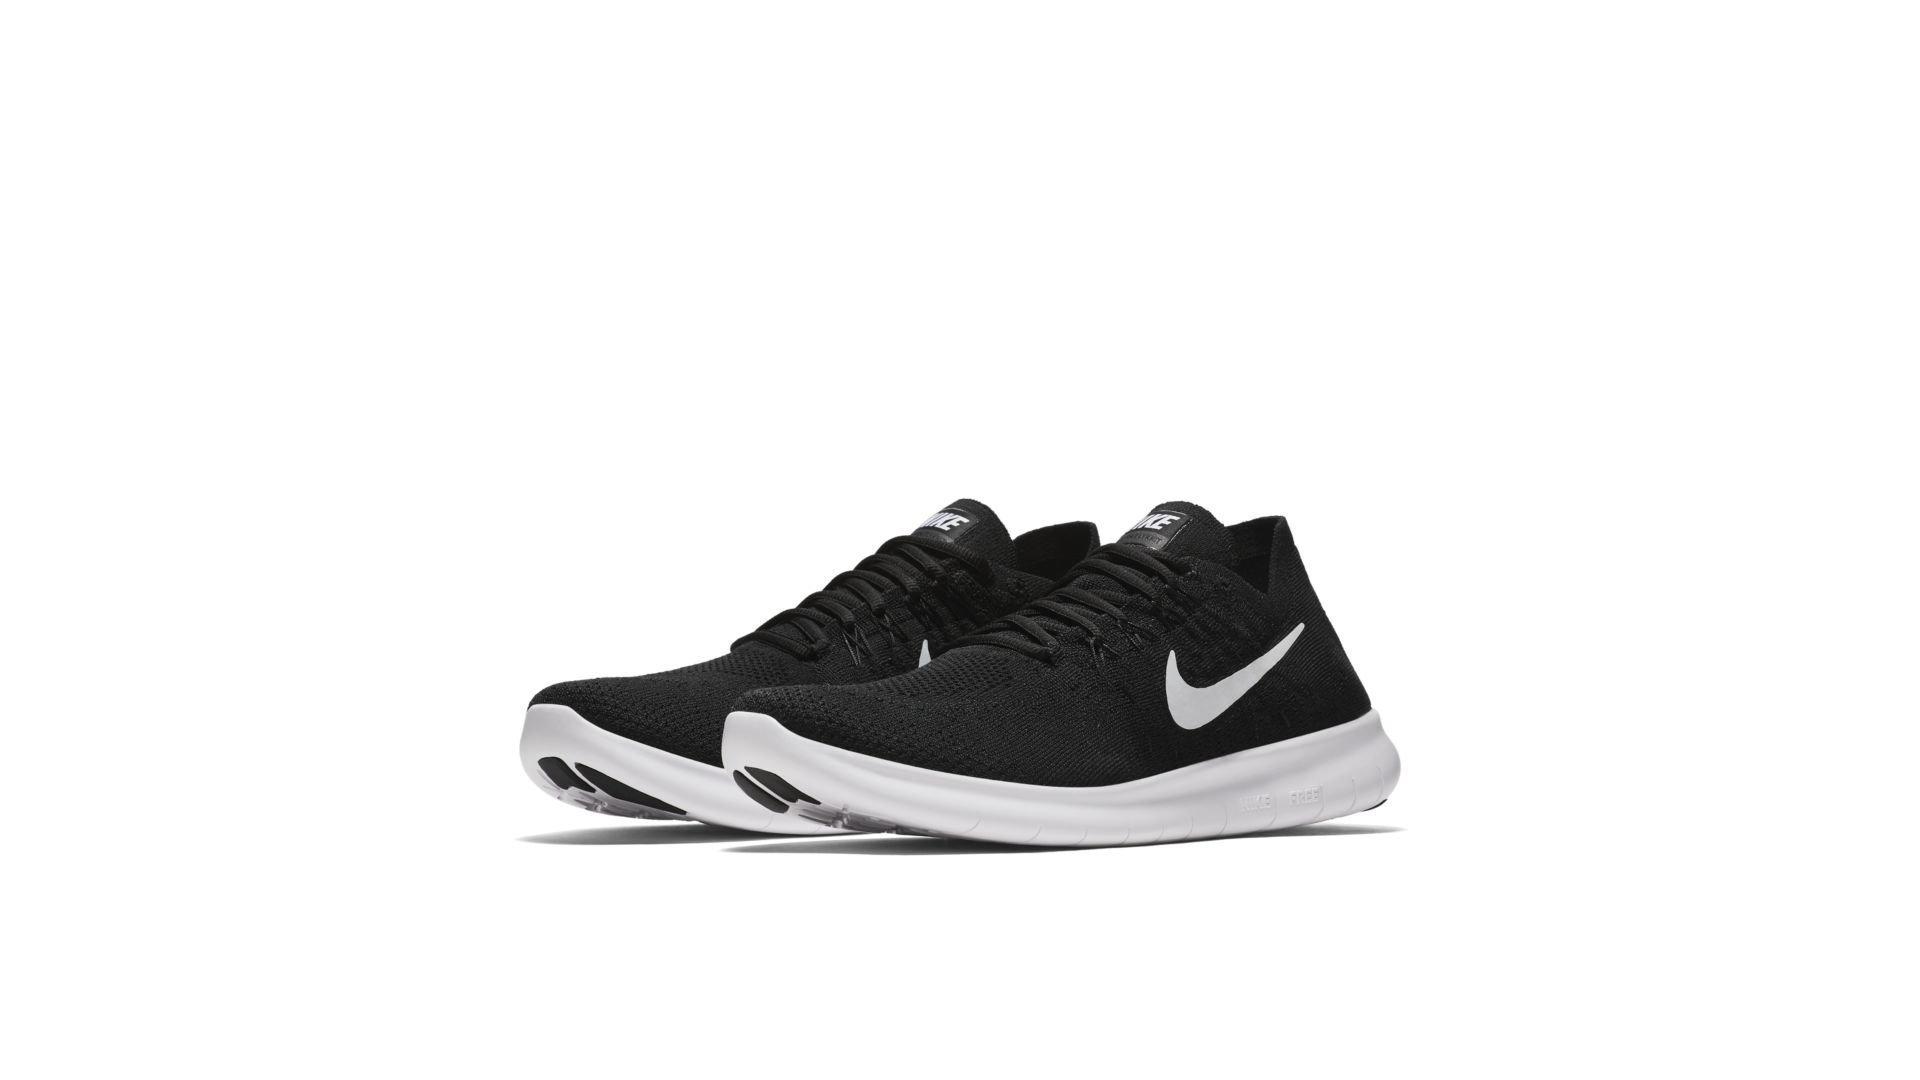 Nike Free RN Flyknit 2017 Black White (880843-001)